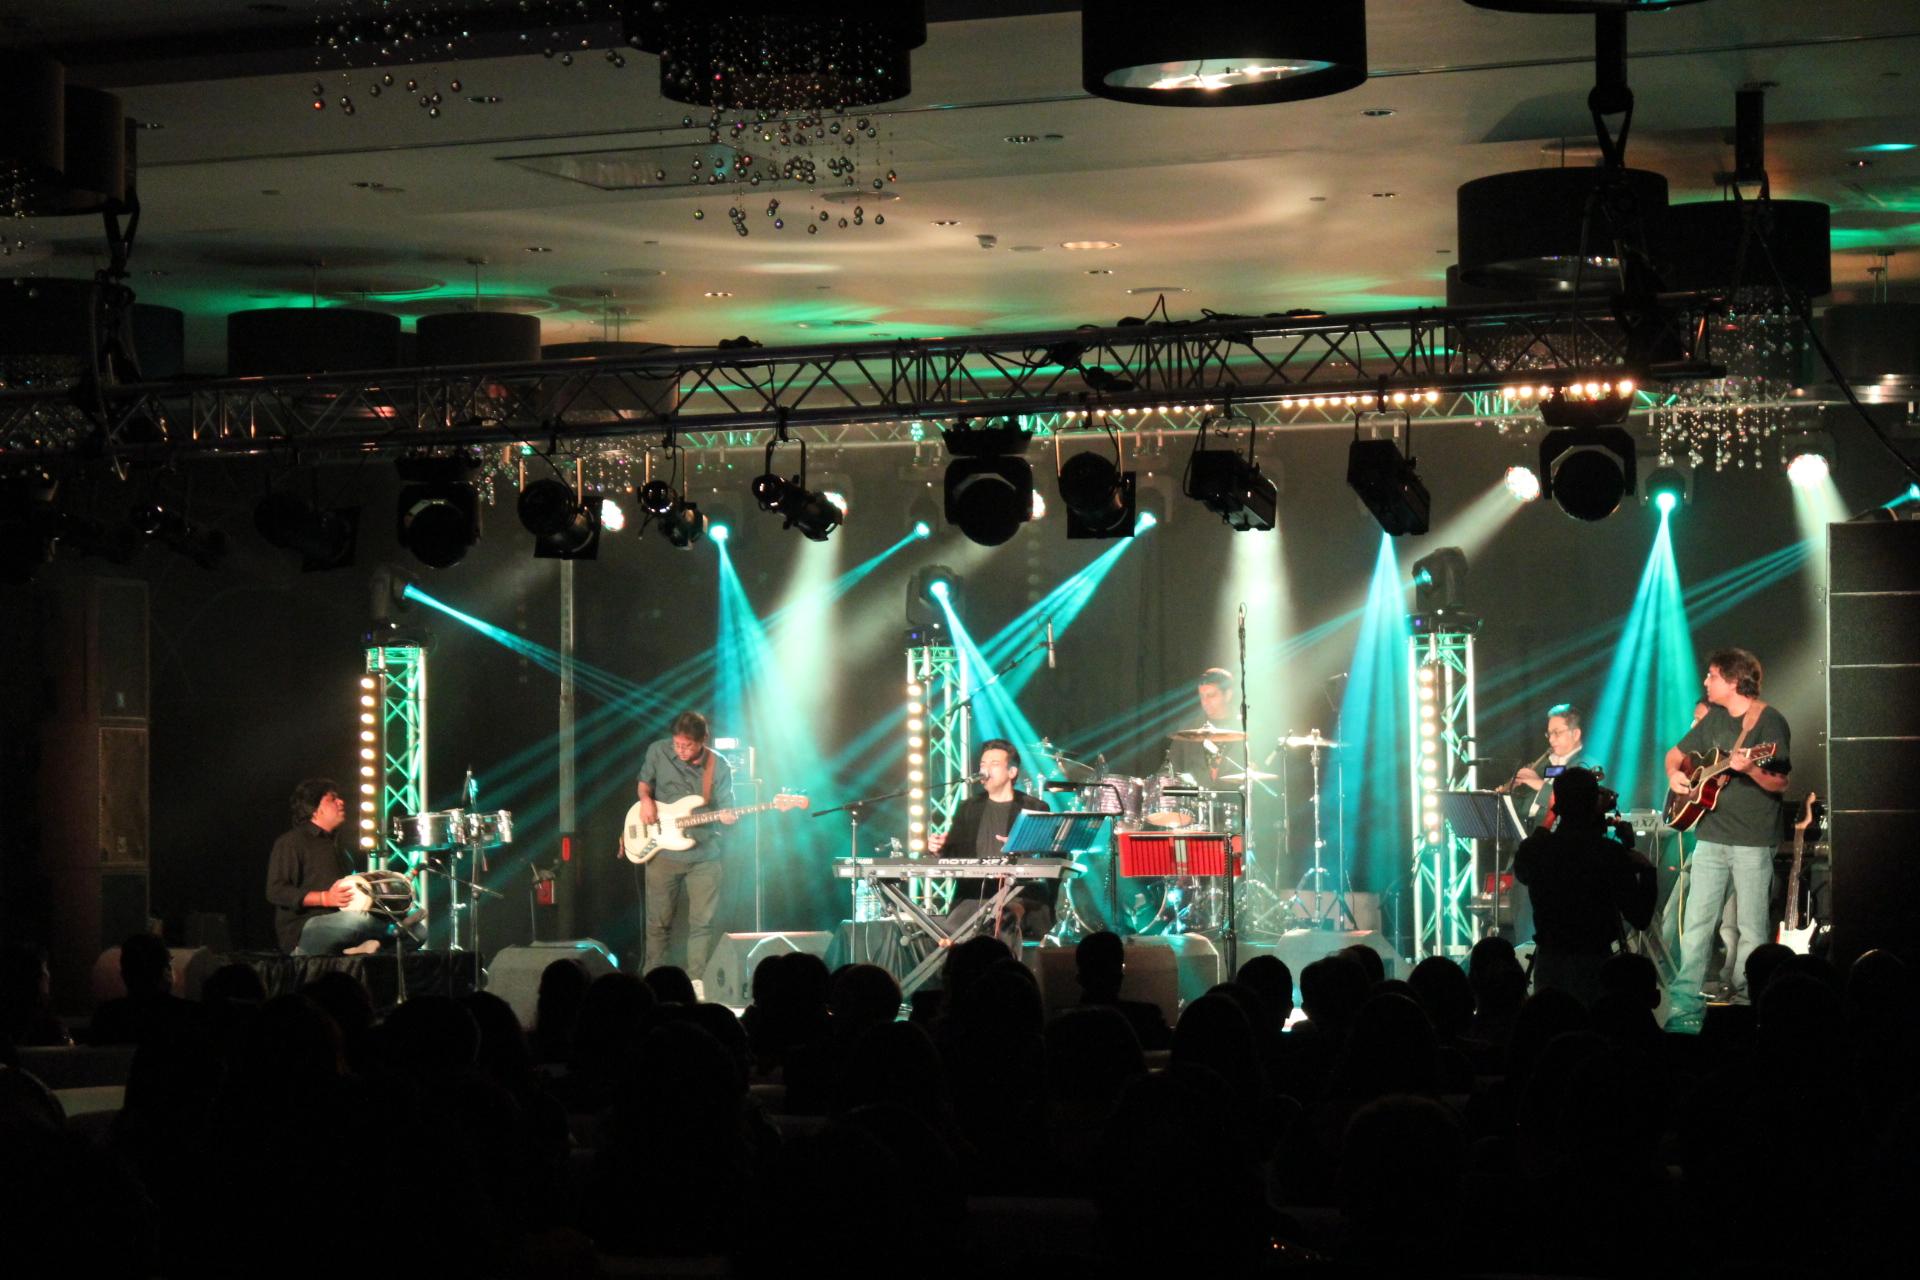 Adnan Sami performs at a Private Party